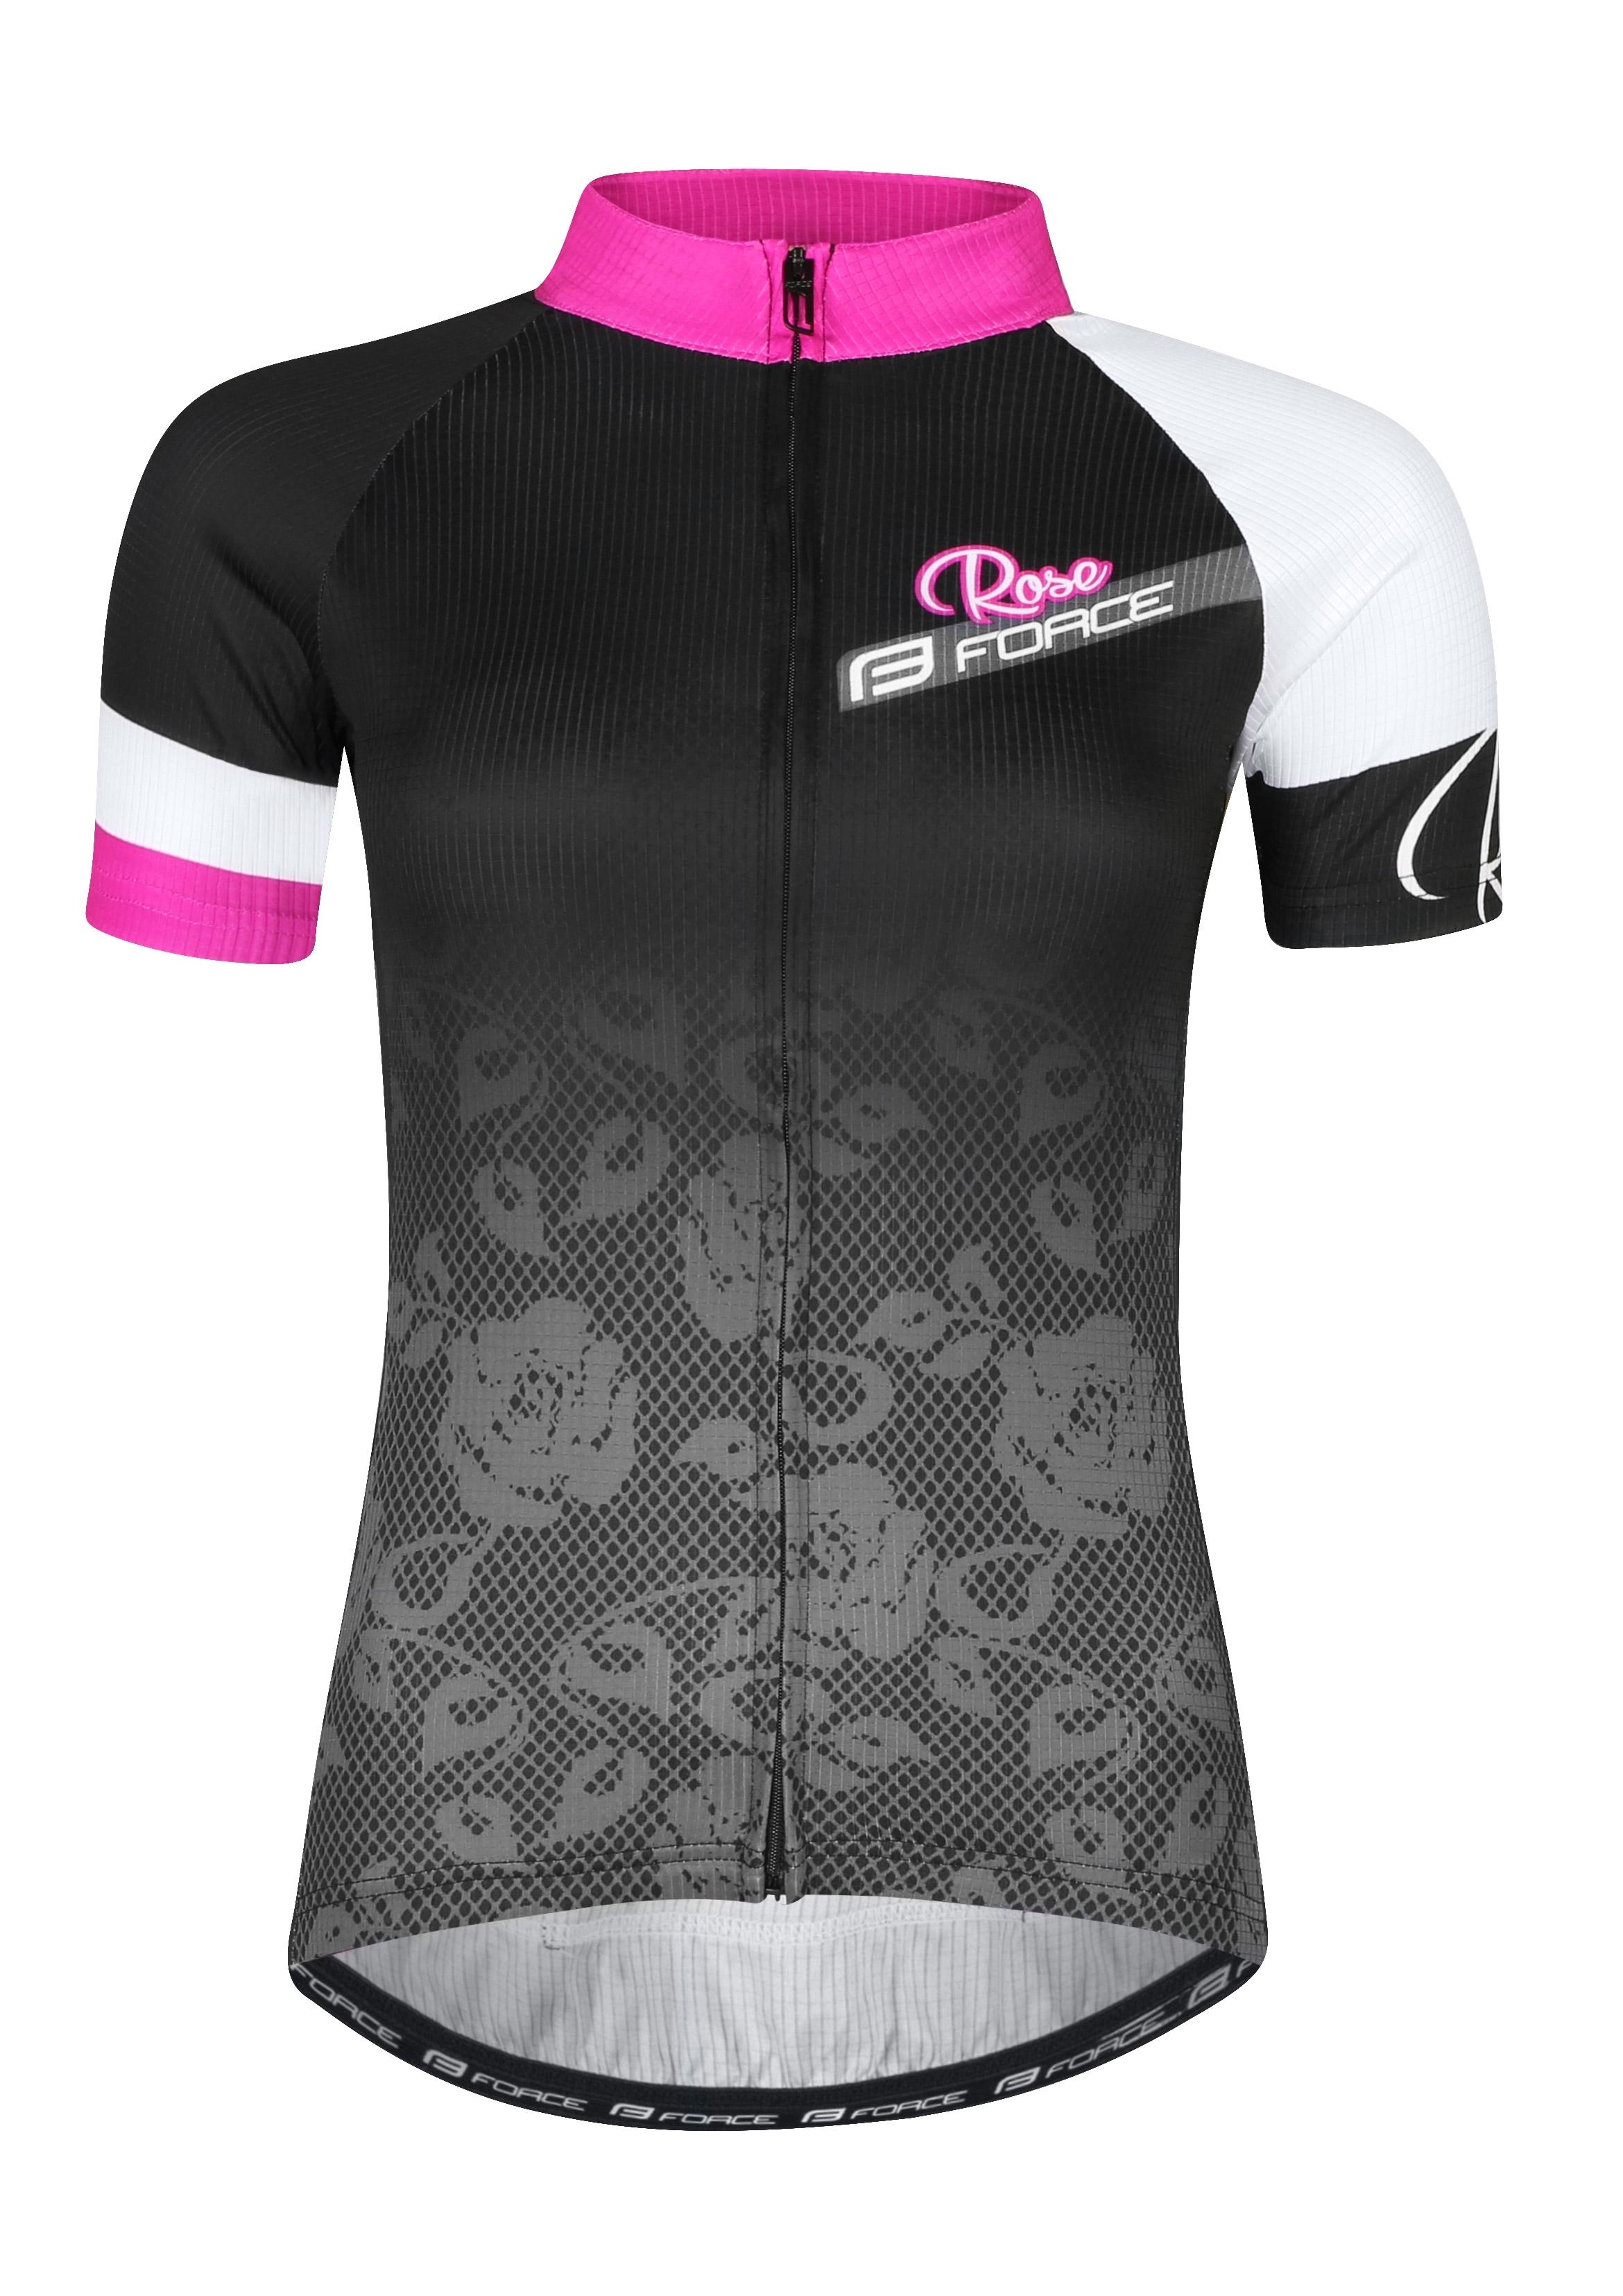 dres FORCE ROSE dámský kr. rukáv, černo-růžový XL